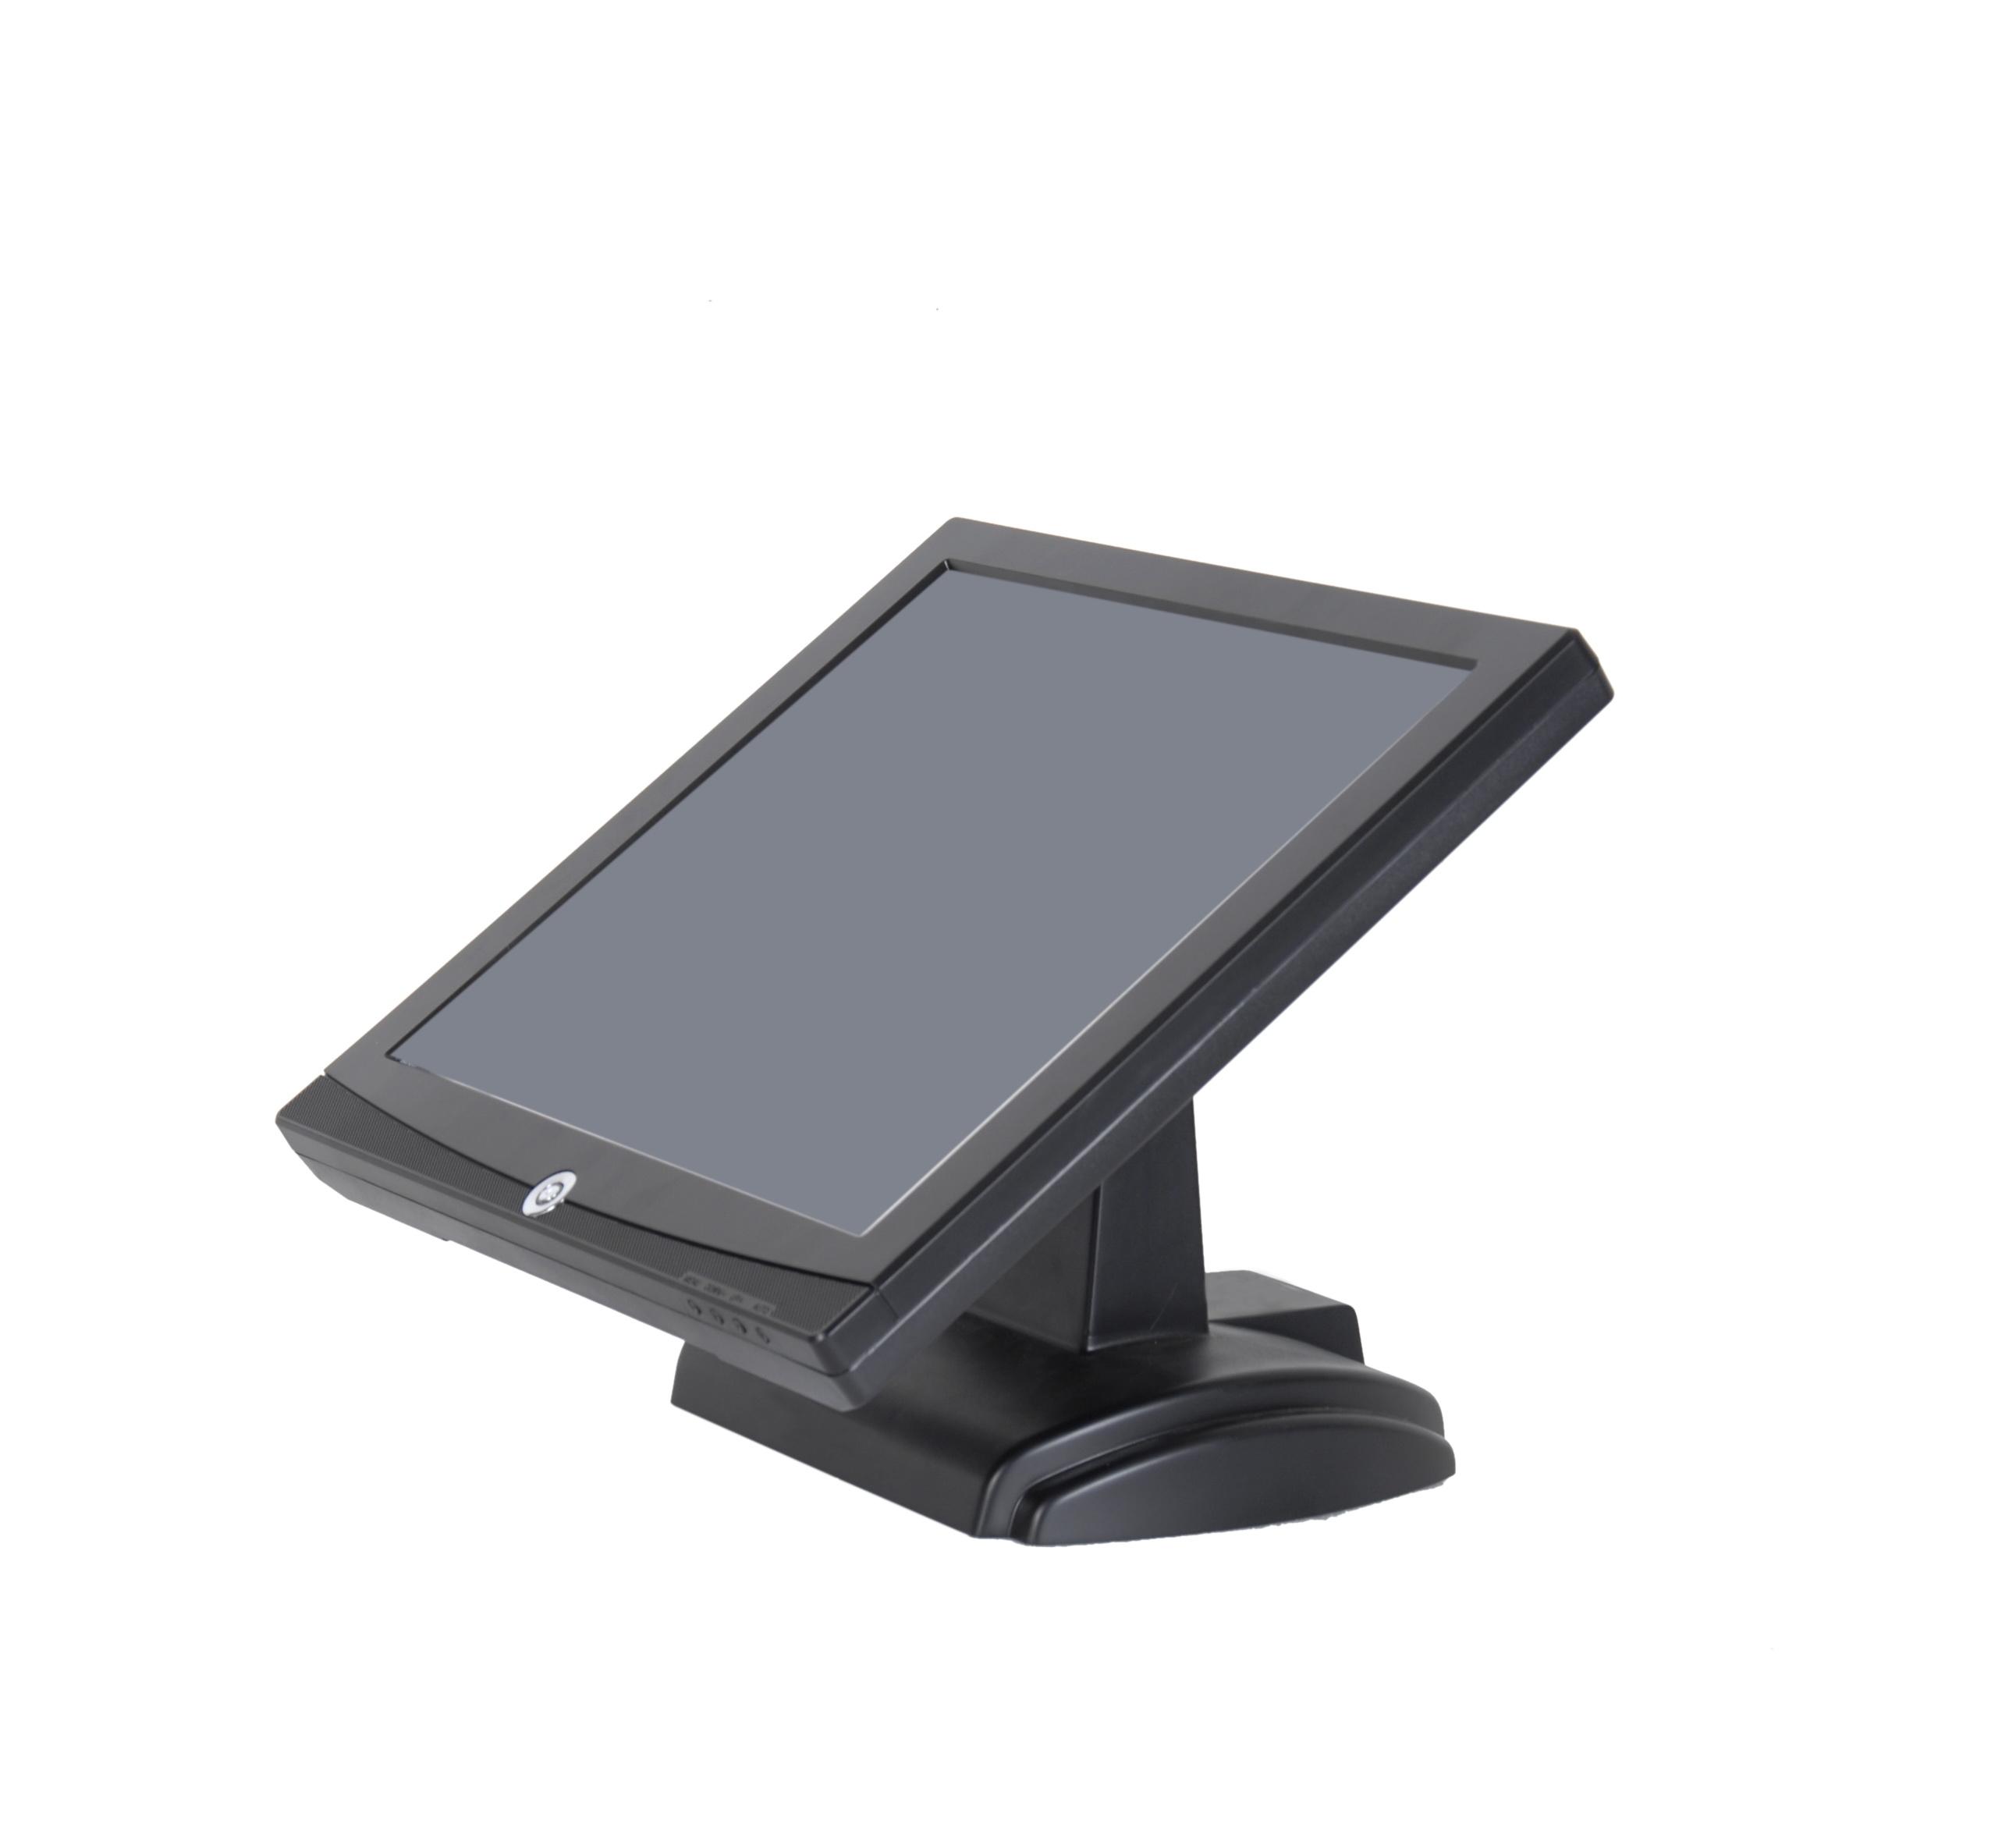 SJZZ-GL17-01R 触摸显示器